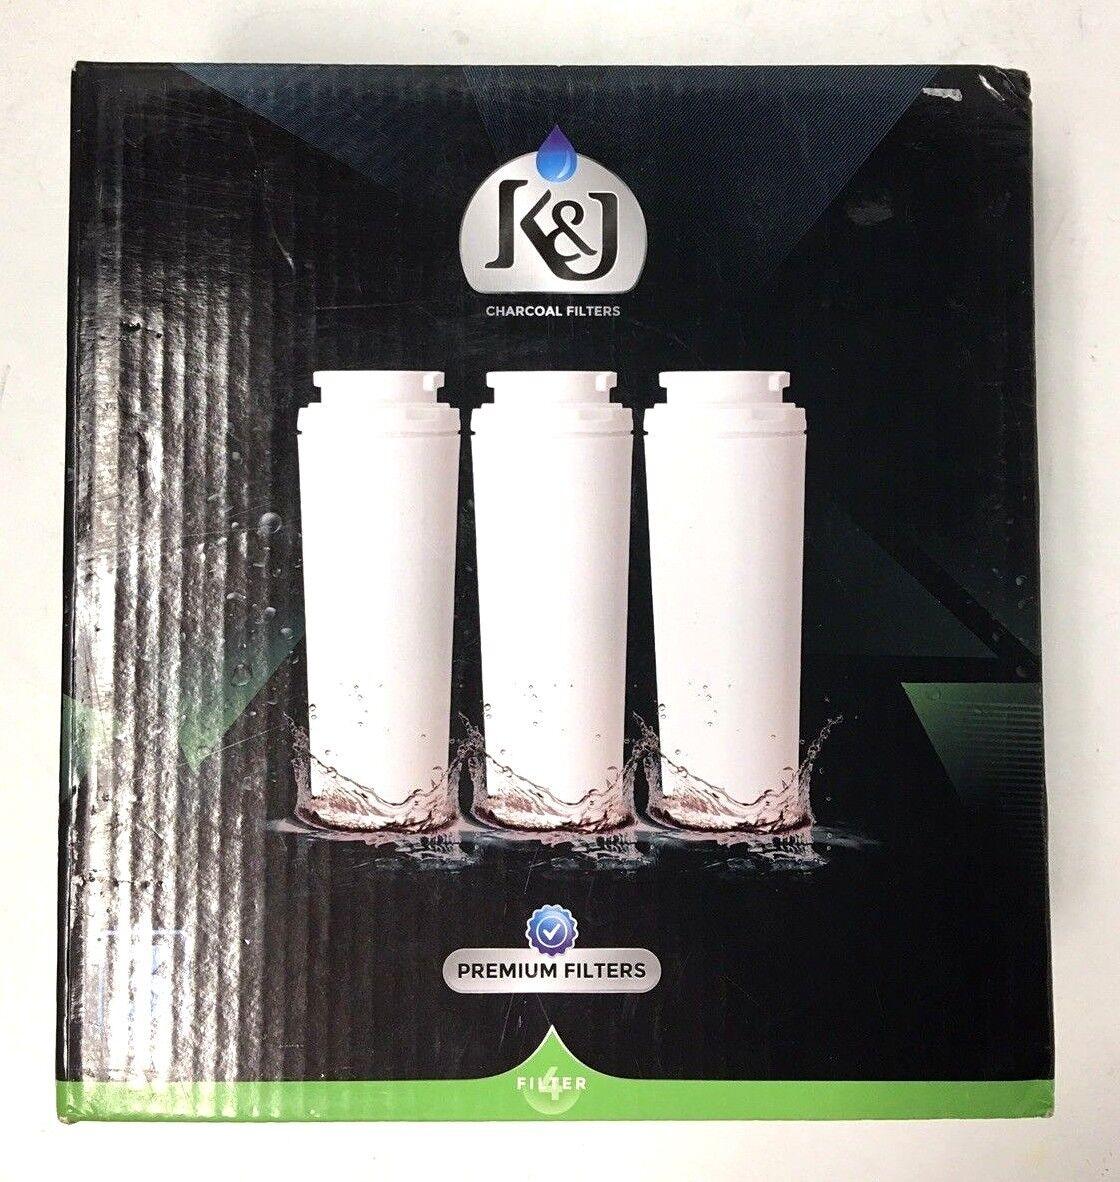 K&J 3 Pack Refrigerator Water Filters-